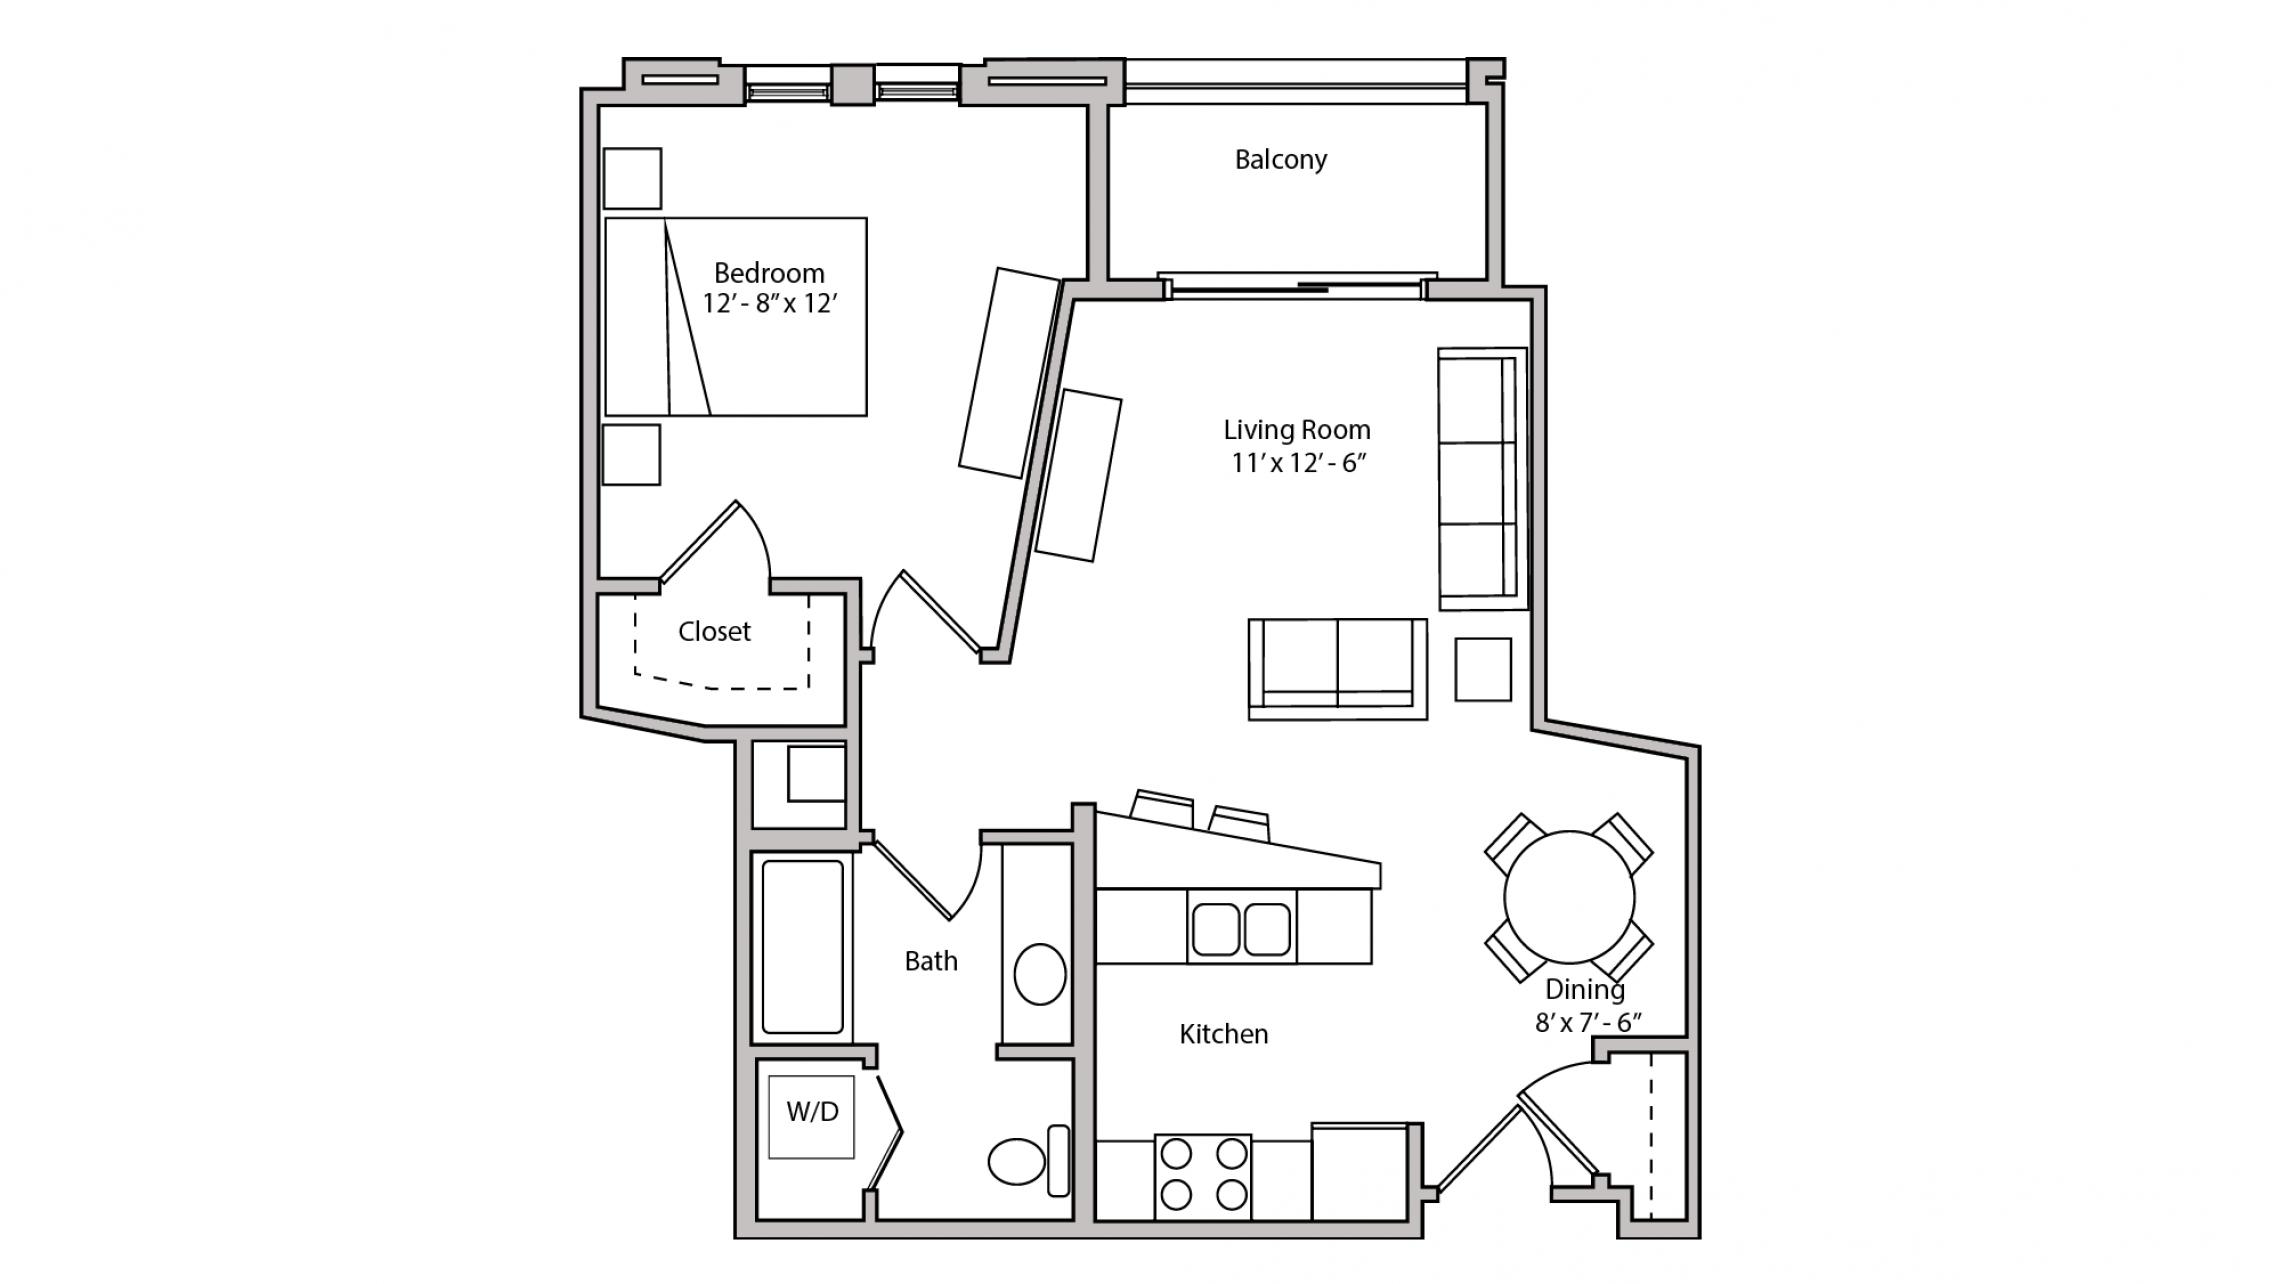 ULI The Depot 1-213 - One Bedroom, One Bathroom